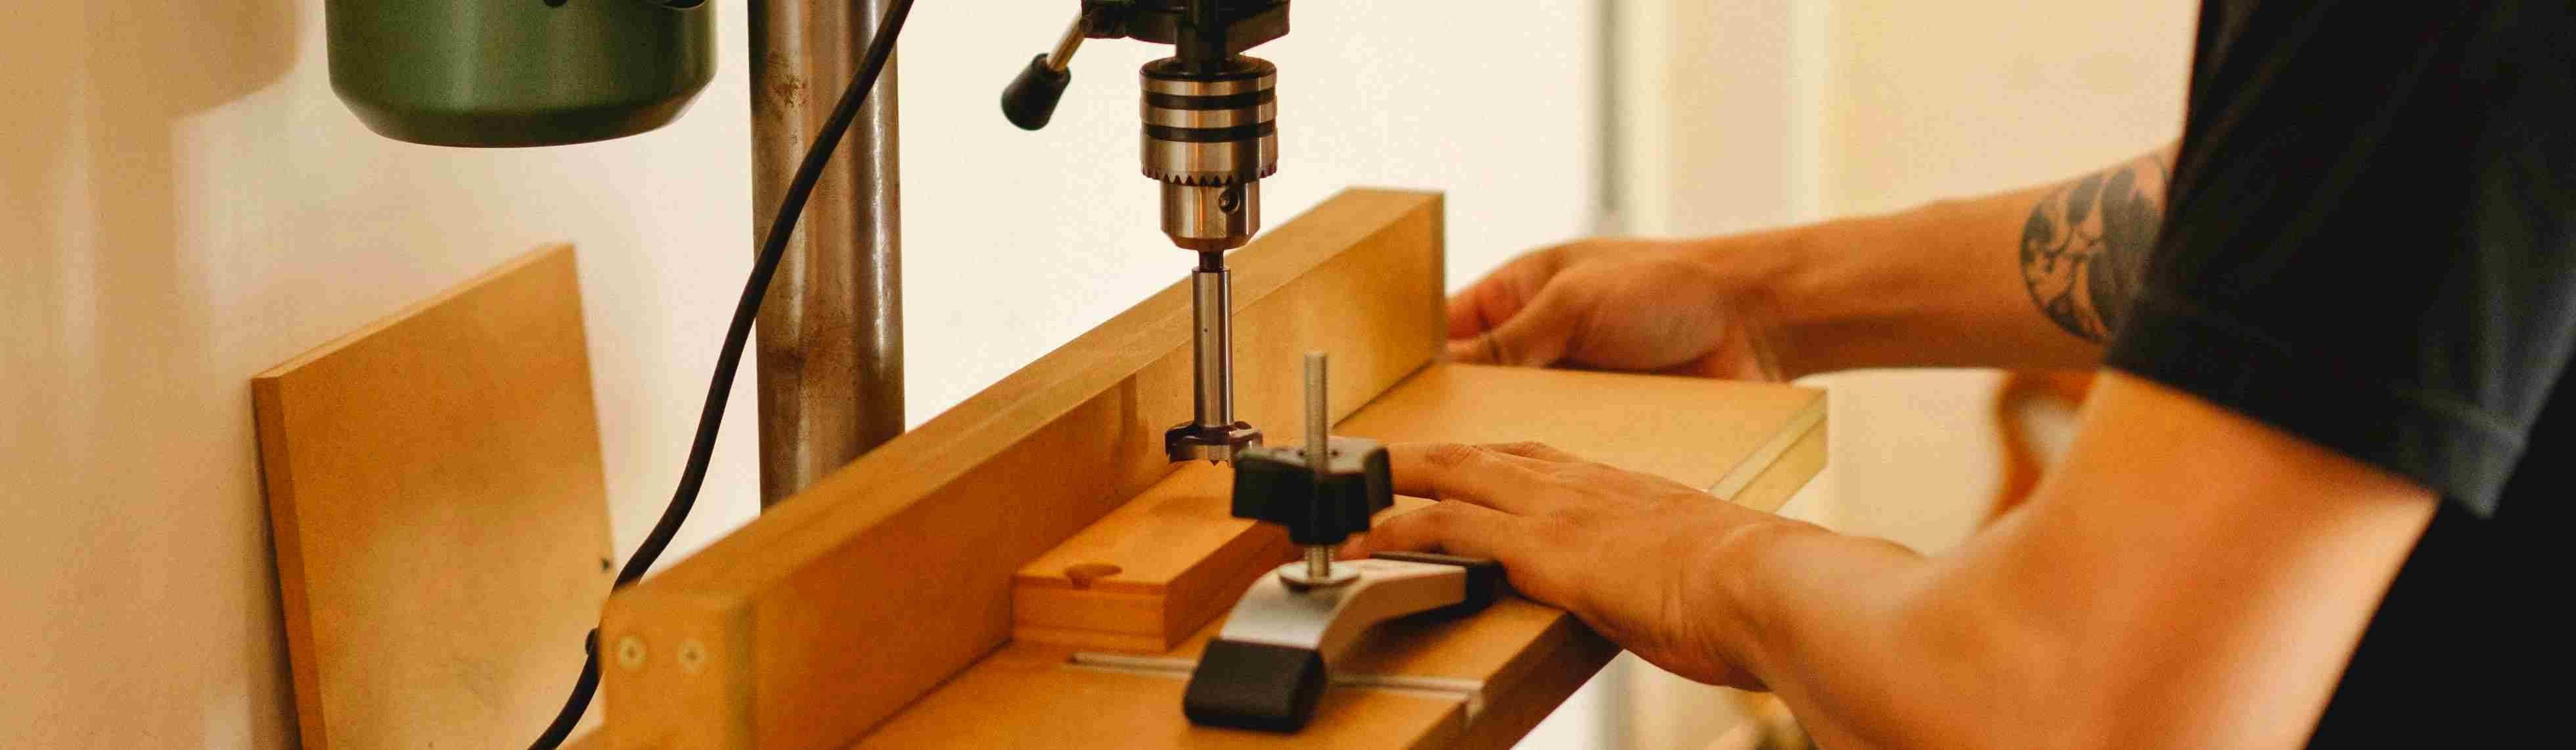 Machine d'atelier